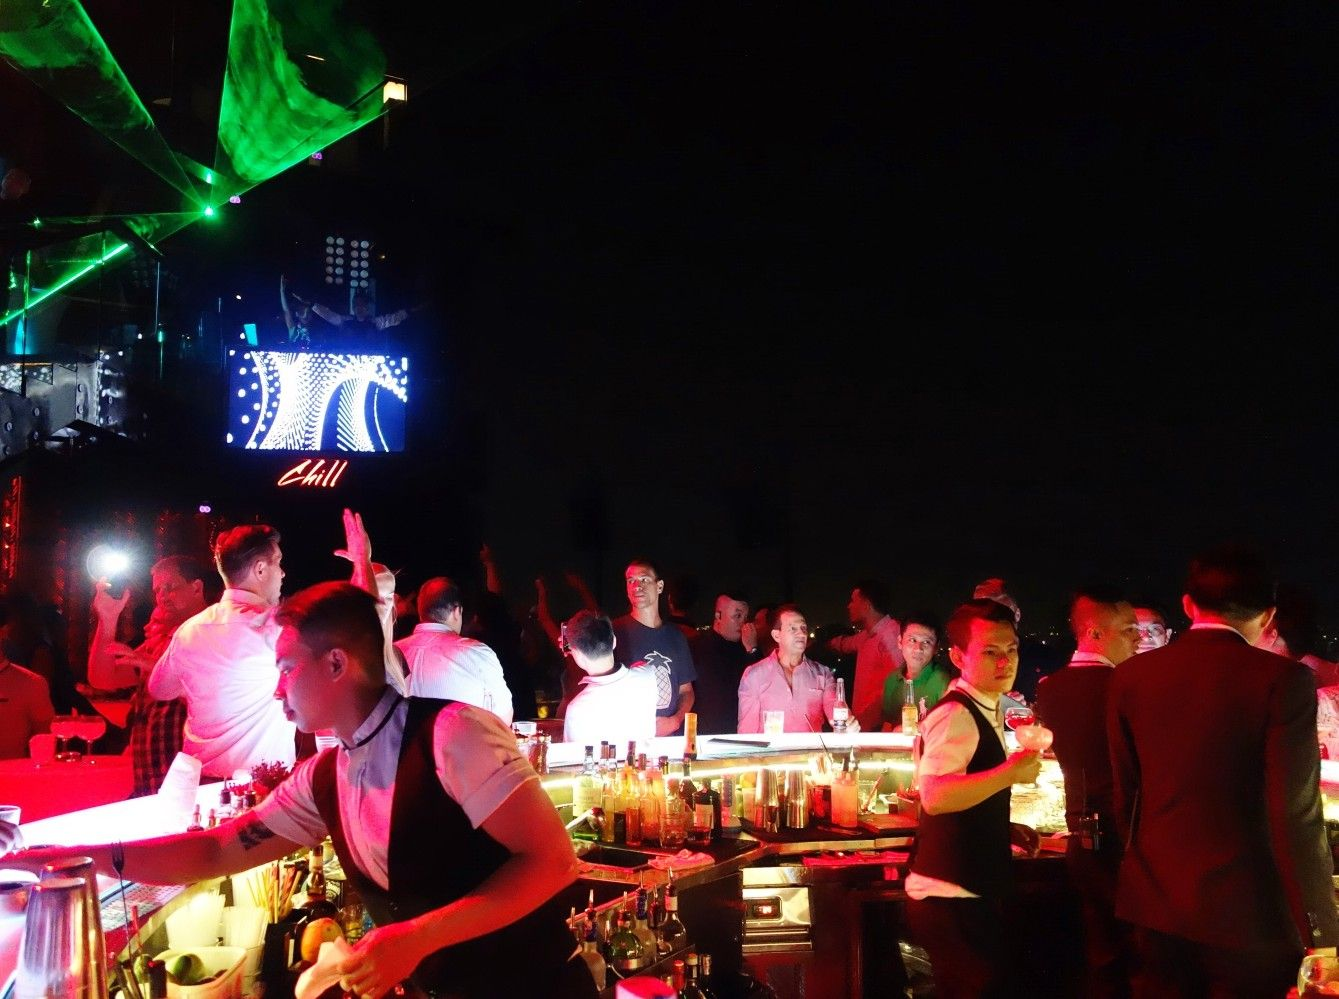 Chill Sky Bar Saigon View - Ho Chi Minh City Nightlife